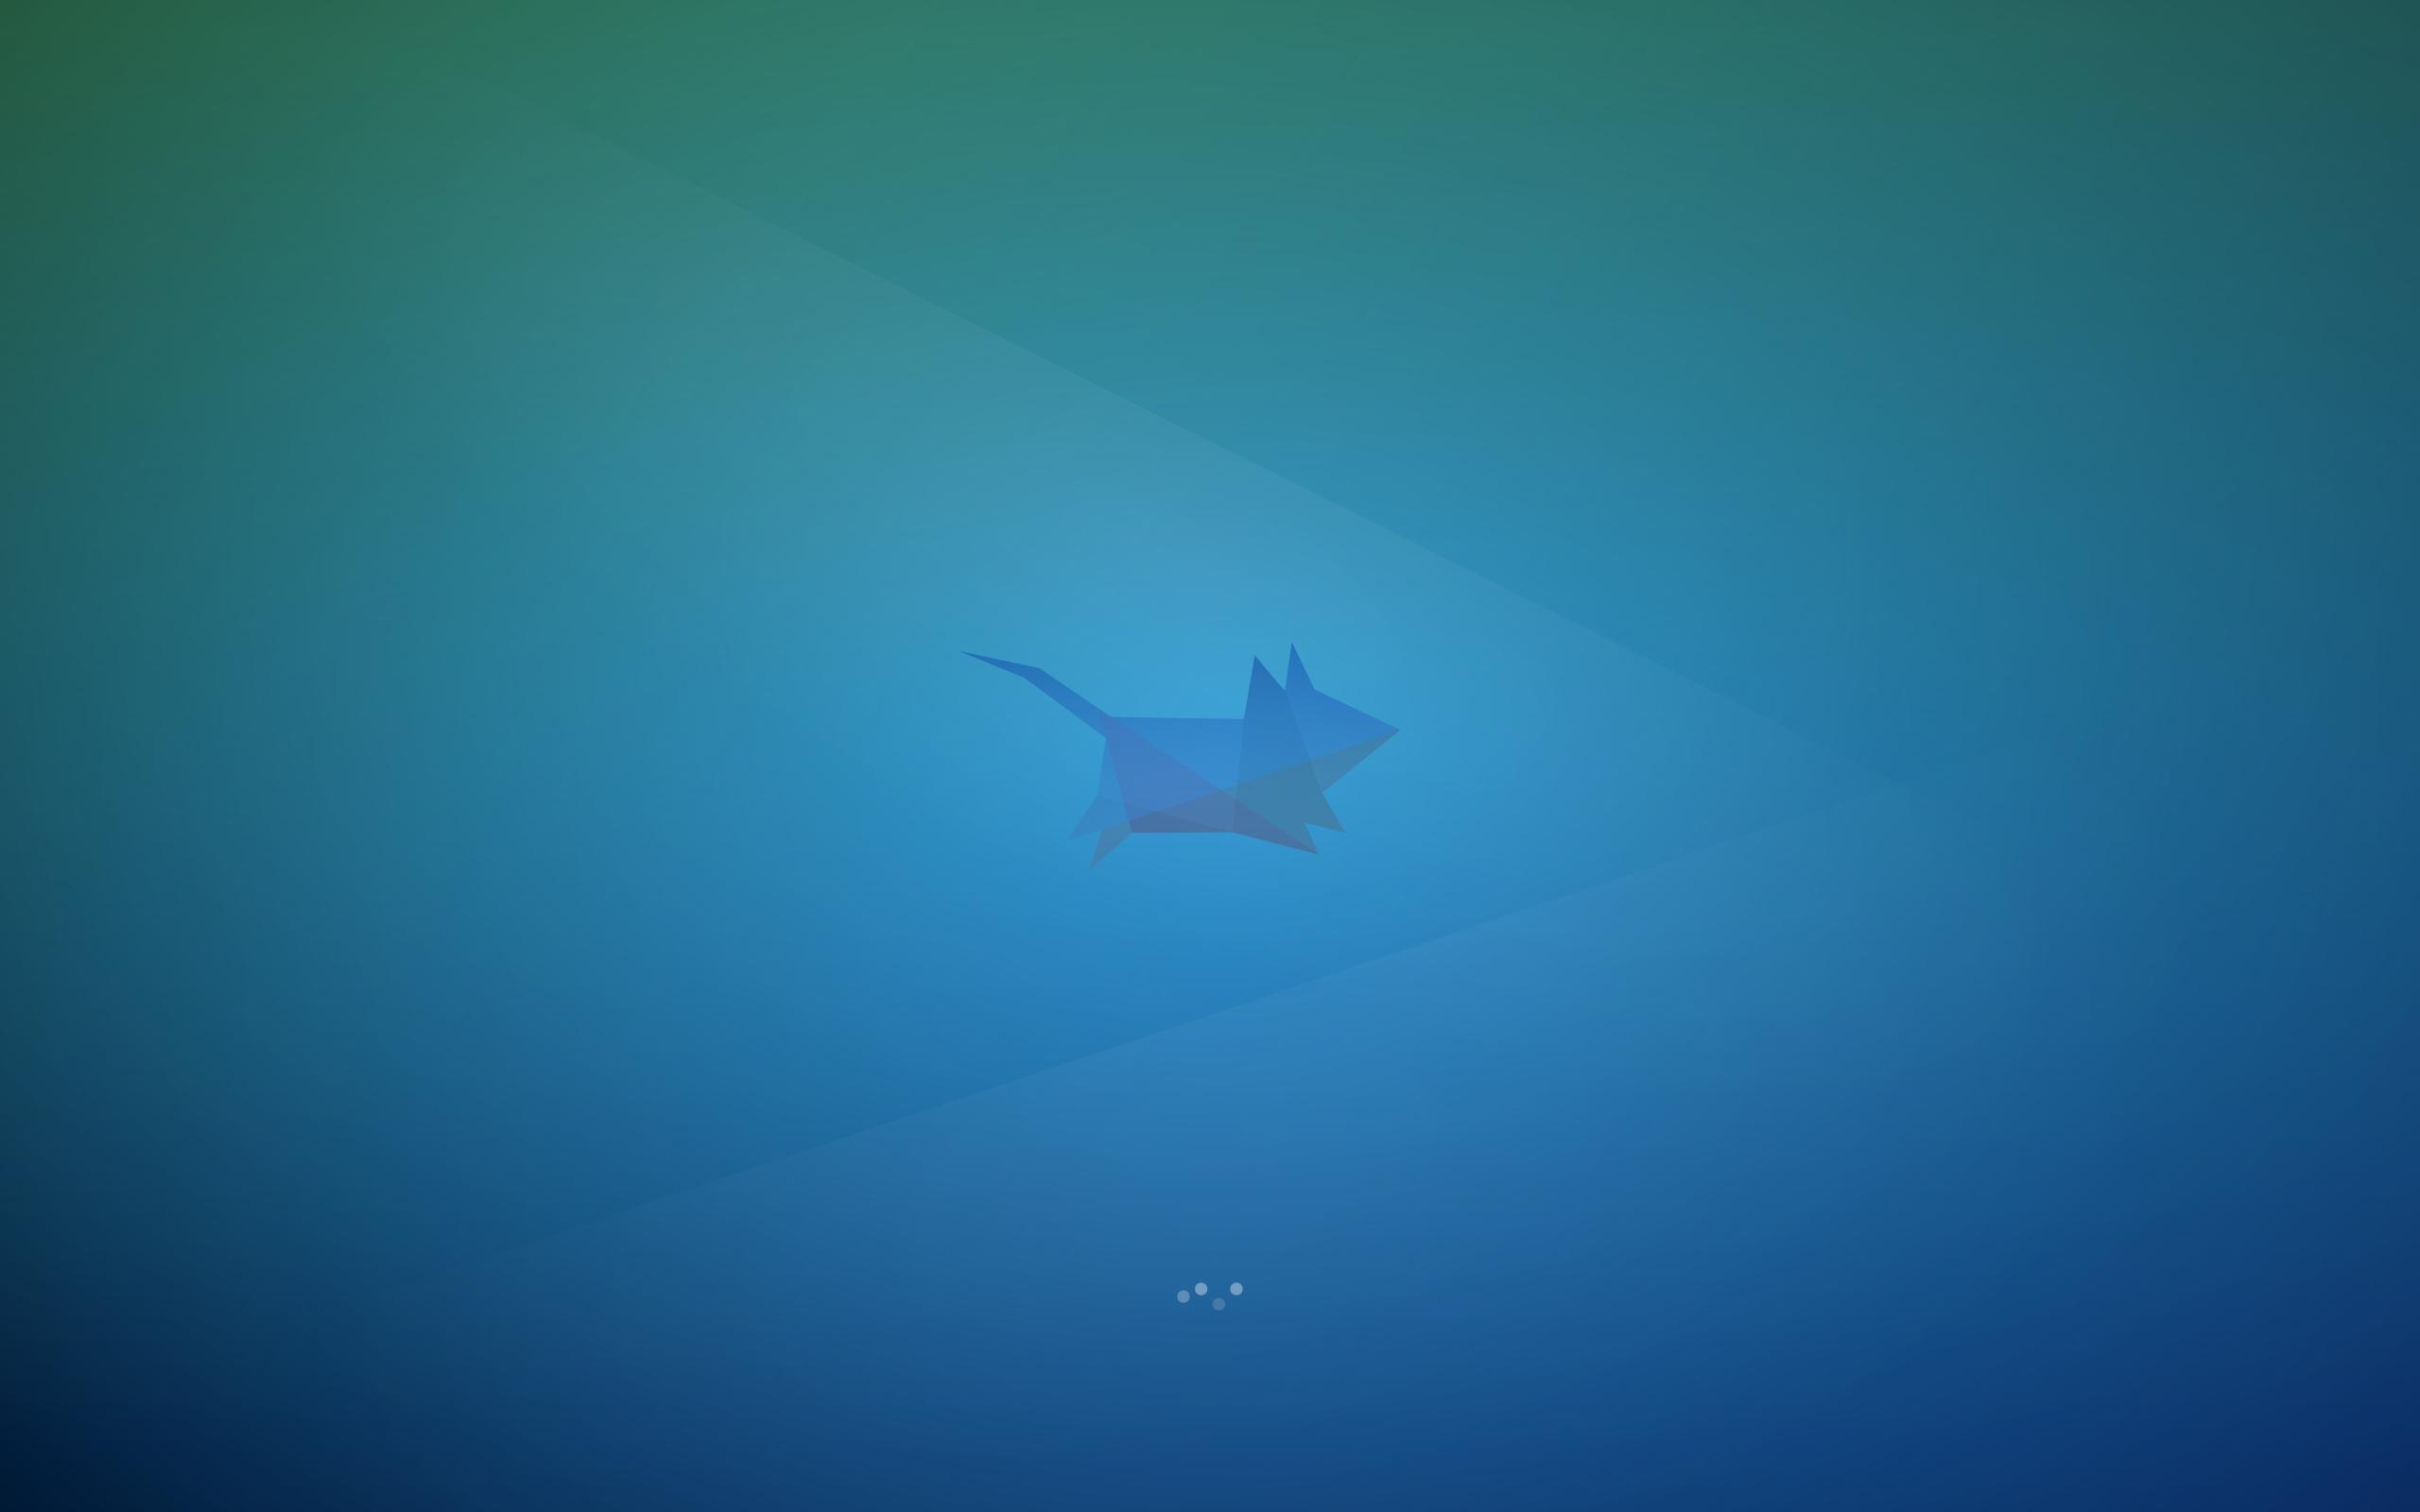 Wallpaper Xubuntu